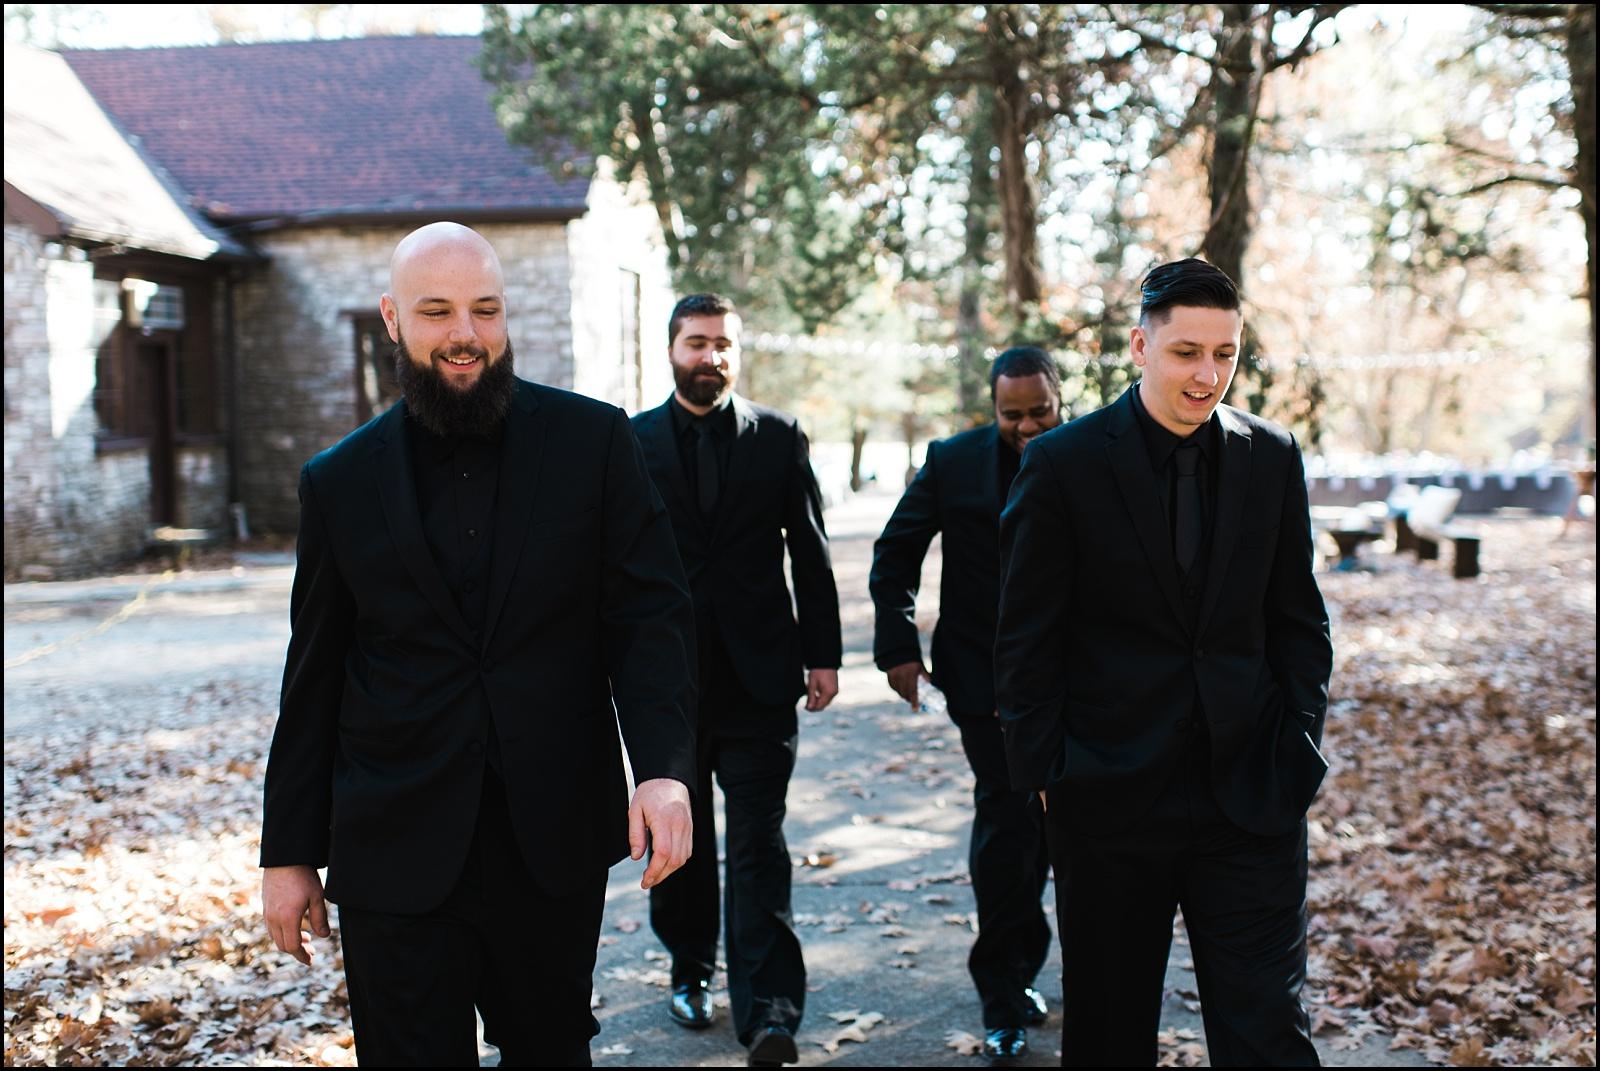 Groomsmen walking